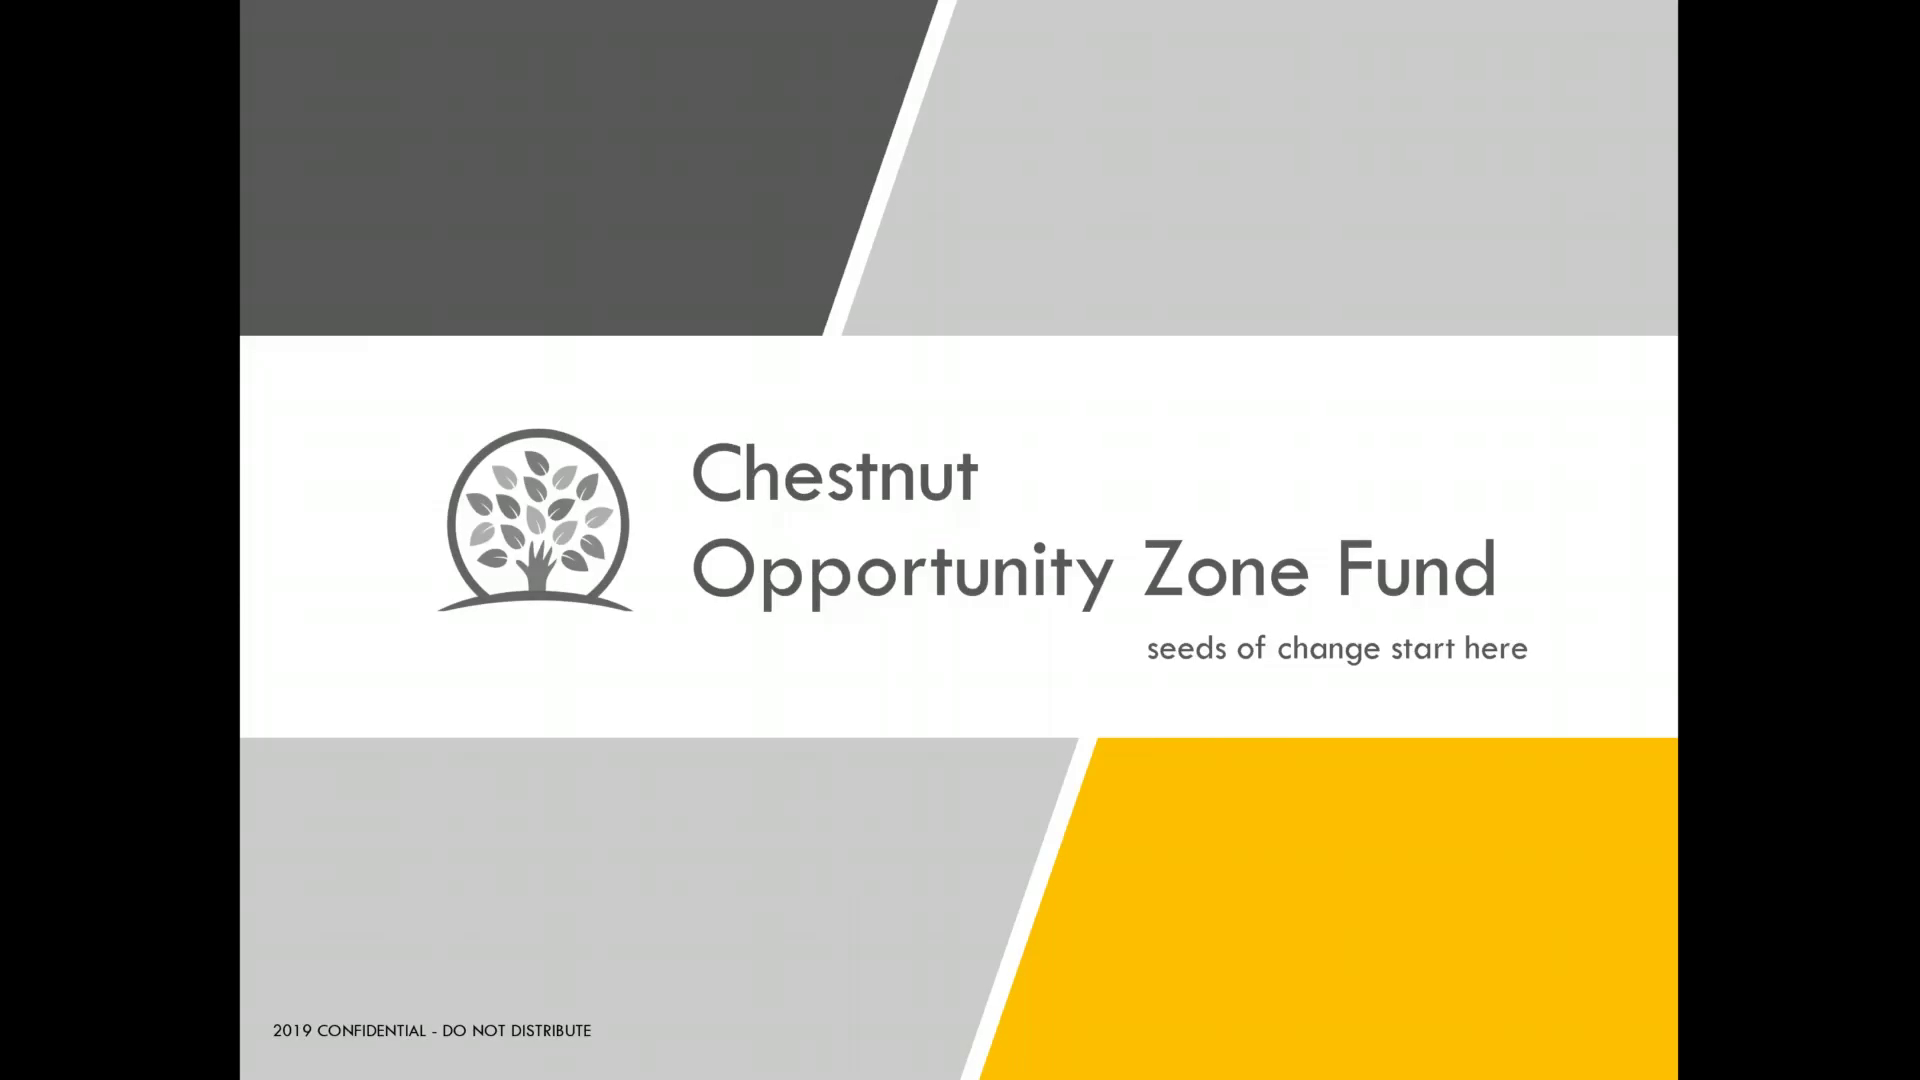 Investment Video - Chestnut Opportunity Zone Fund